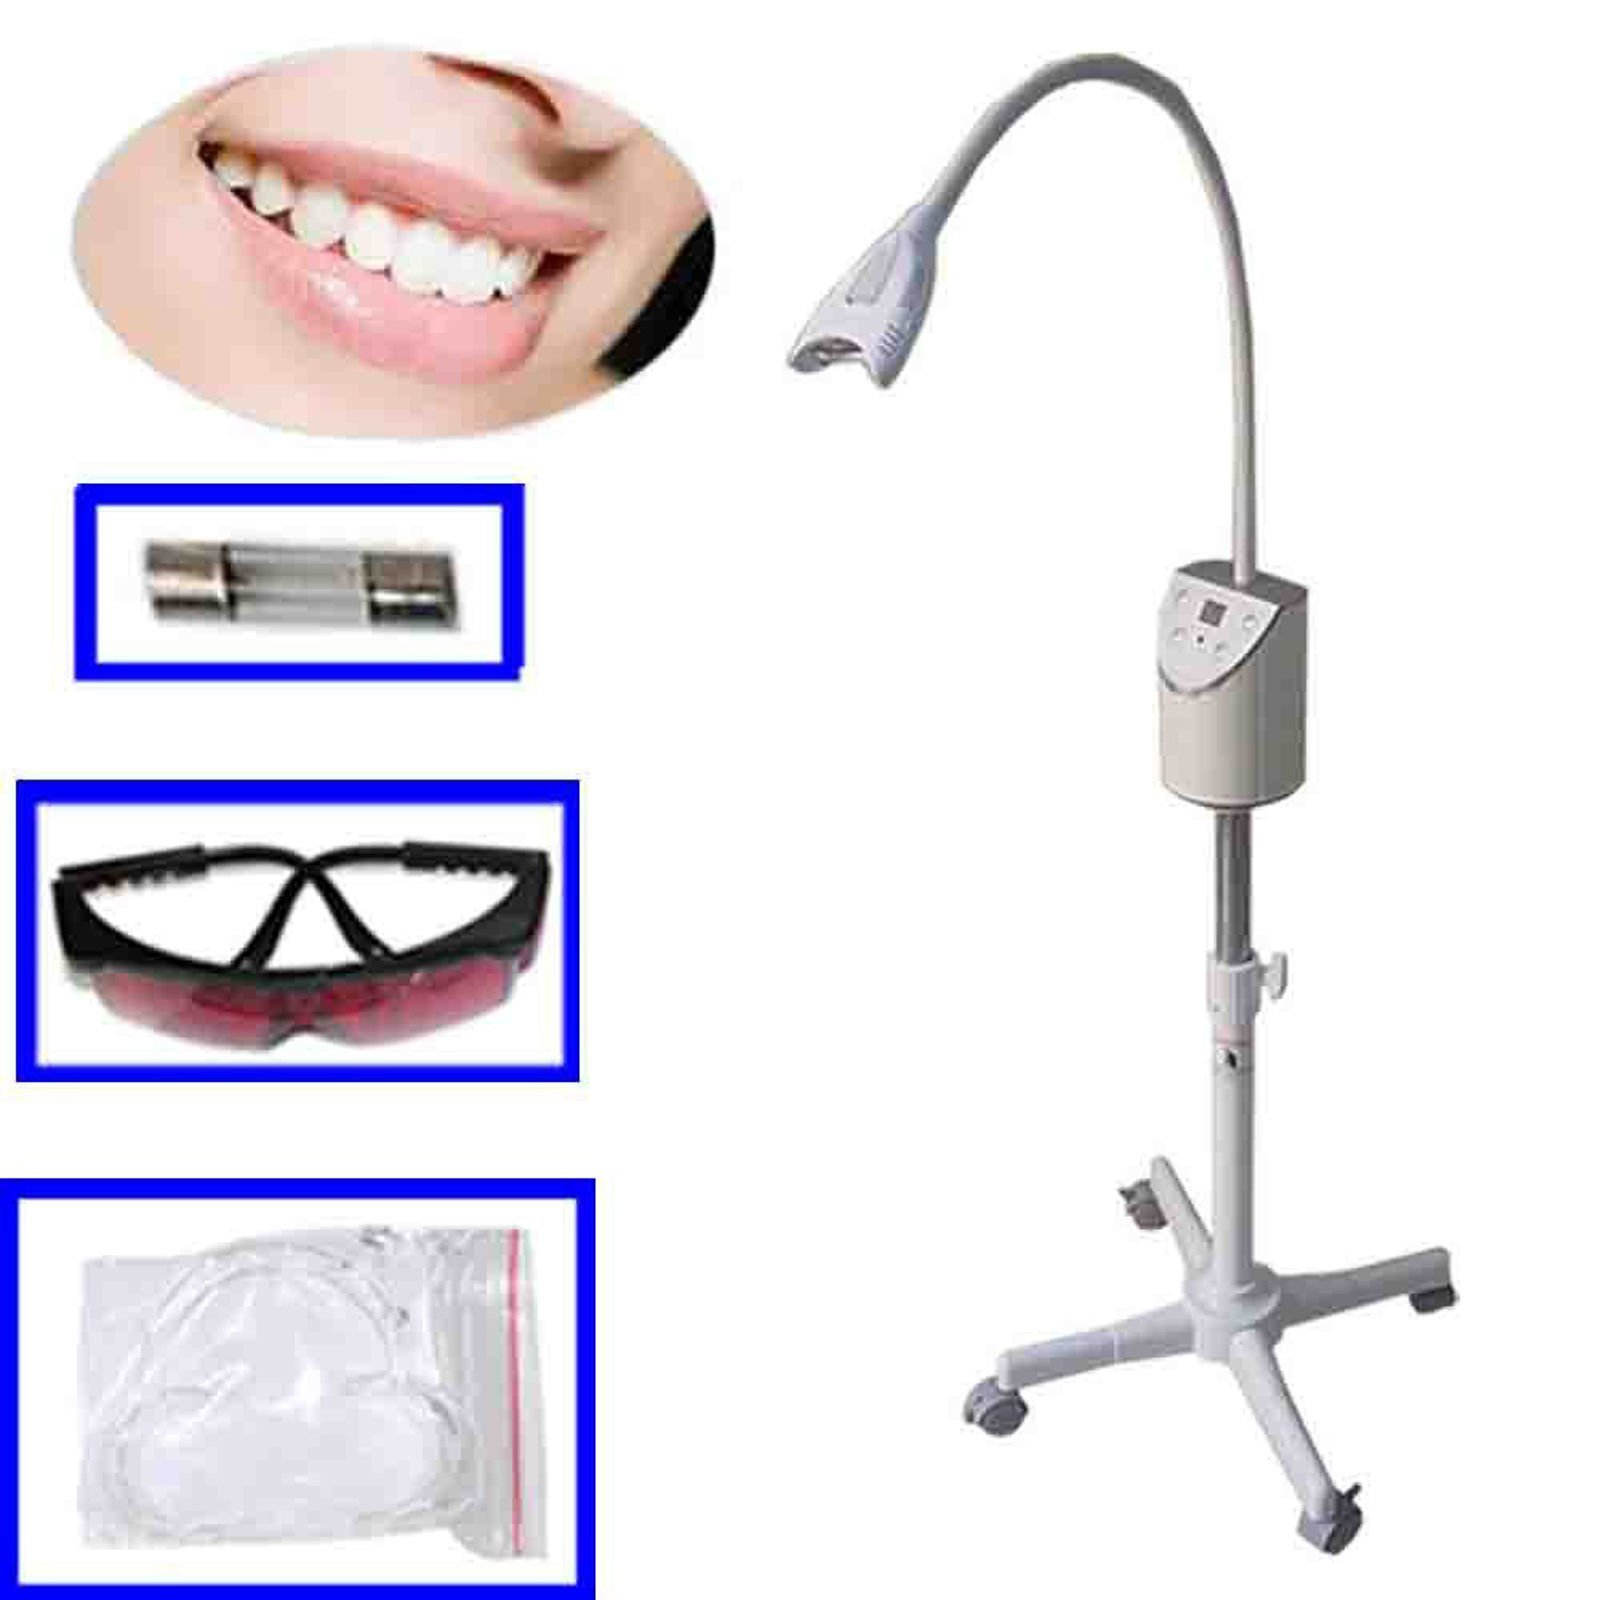 AnHua Brand New Generic Led Light Accelerator Mobile Dental Teeth Bleaching Whitening Machine